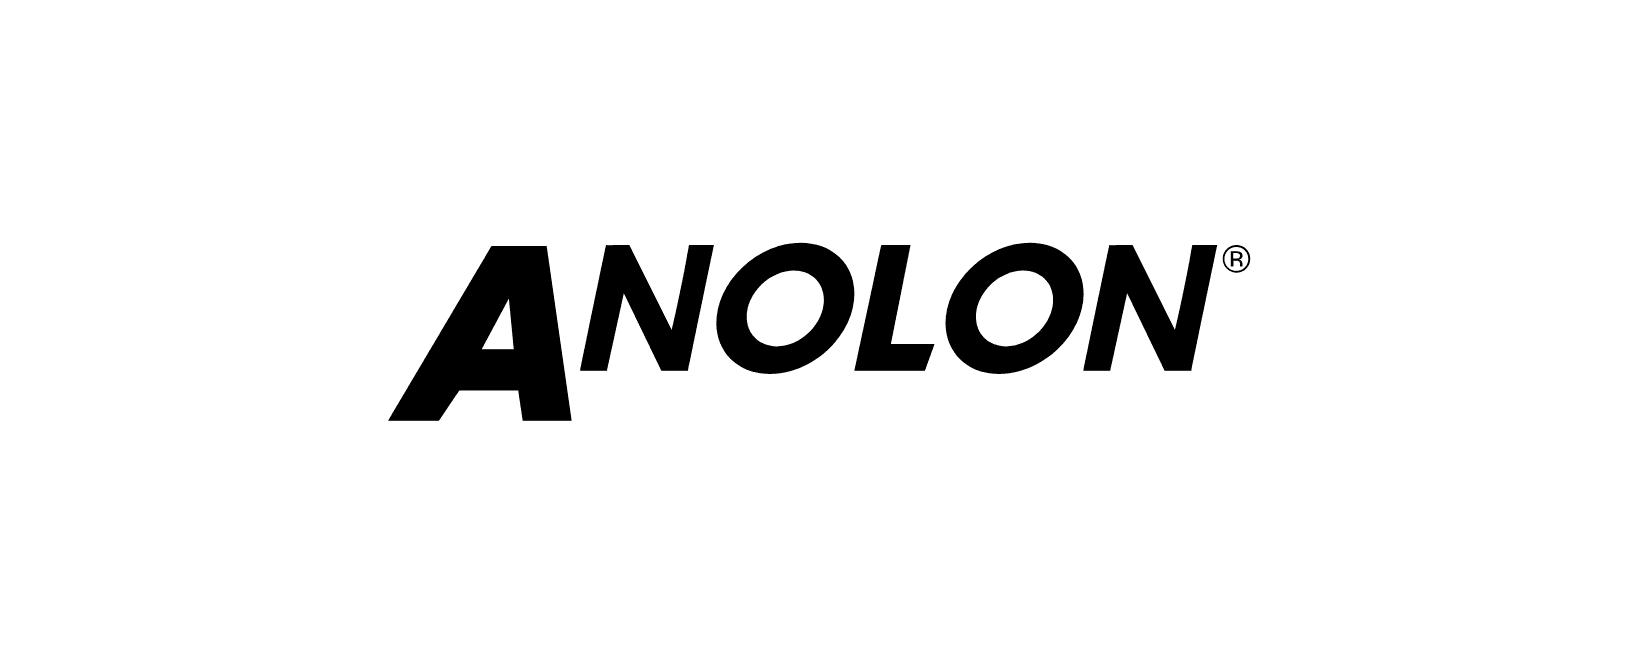 Anolon Coupon Code 2021